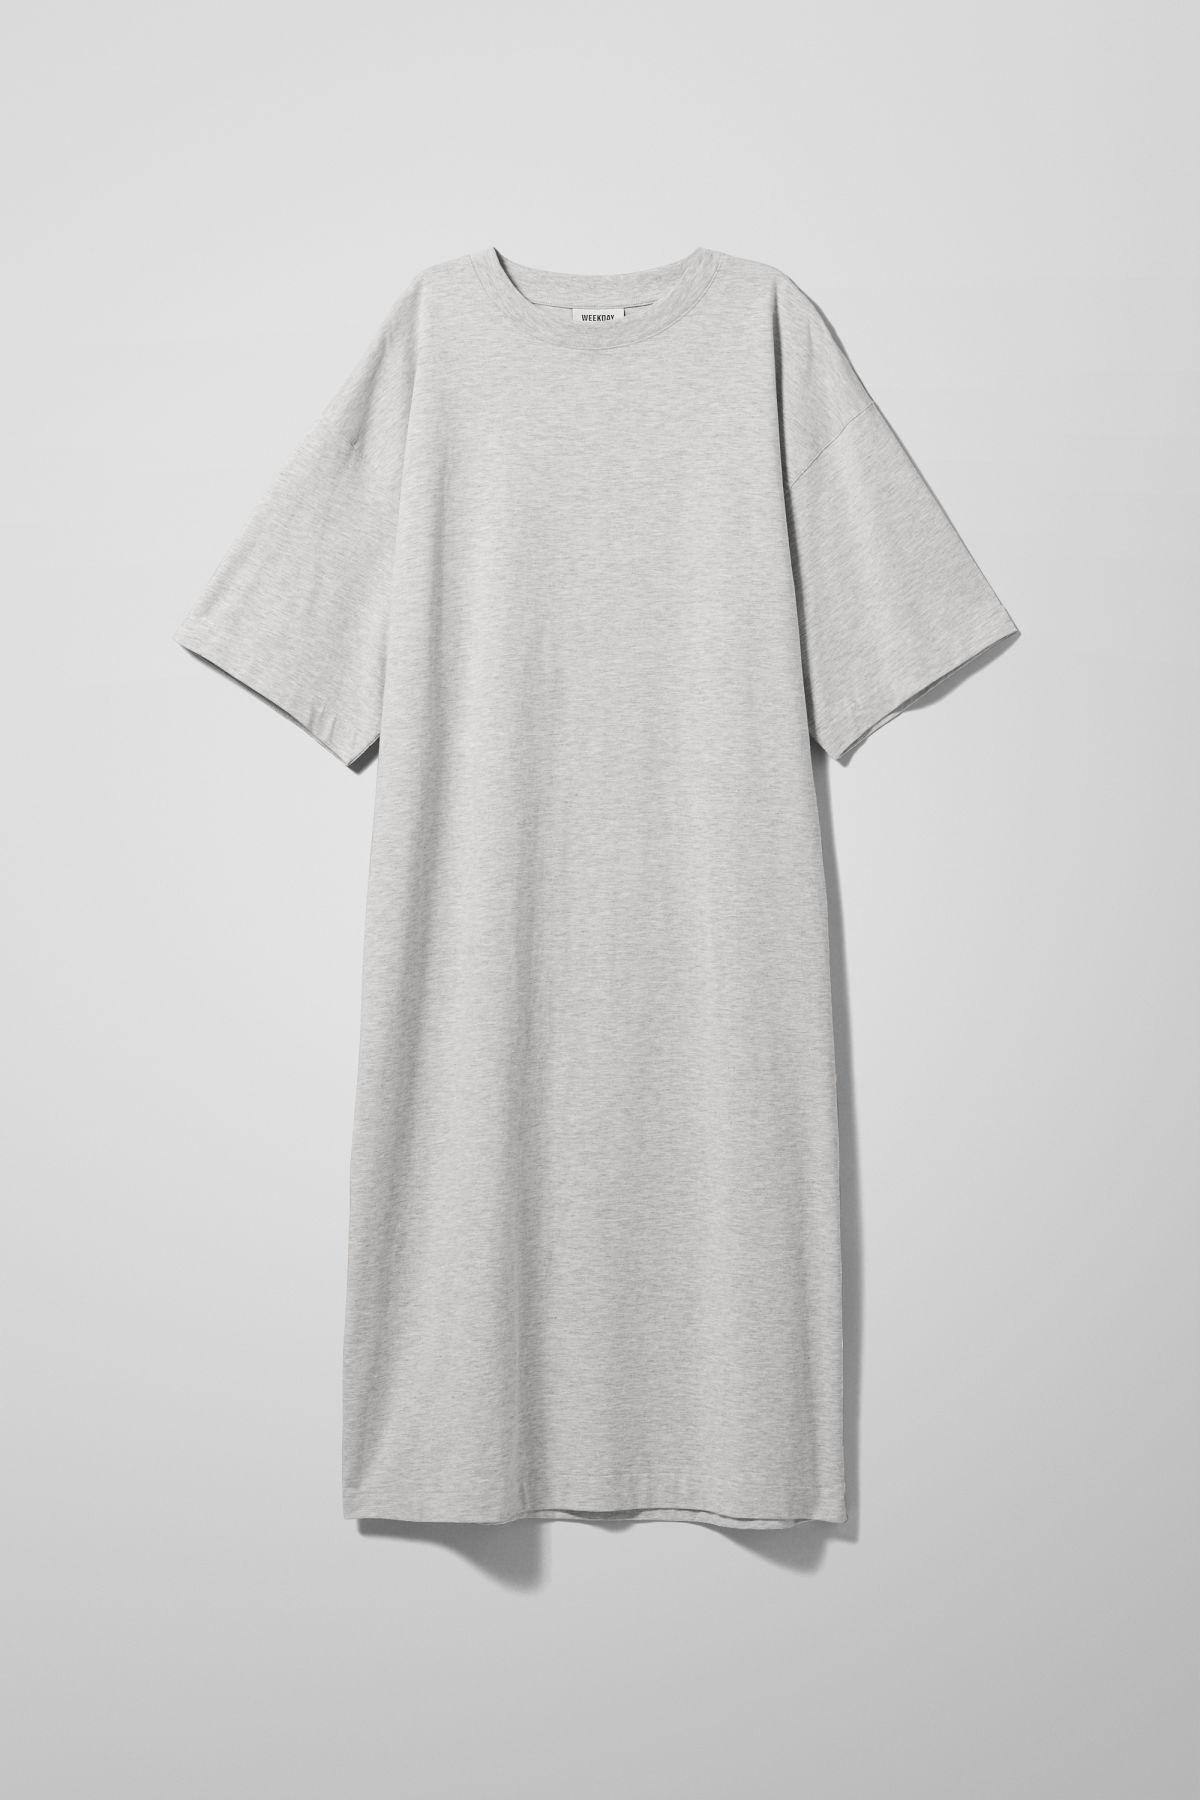 Image of Ines T-Shirt Dress - Grey-XS